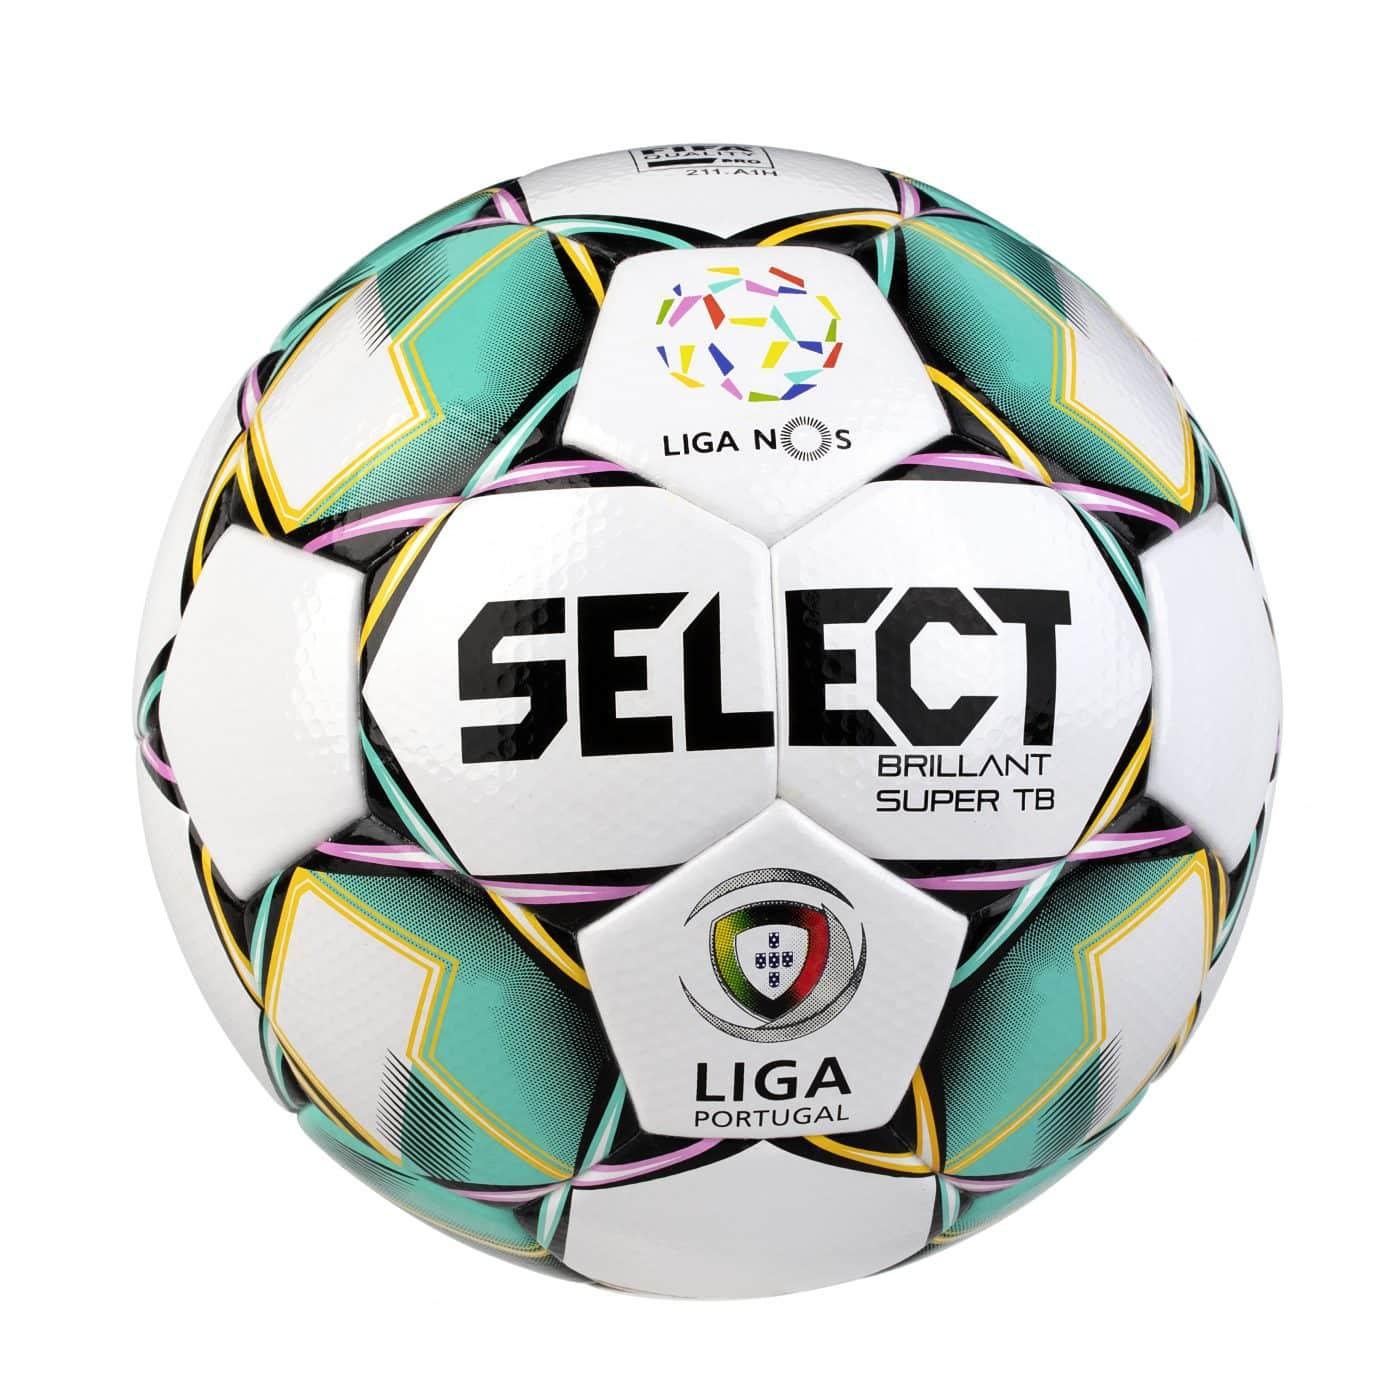 ballon-officiel-liga-nos-championnat-portugal-2020-2021-select-3